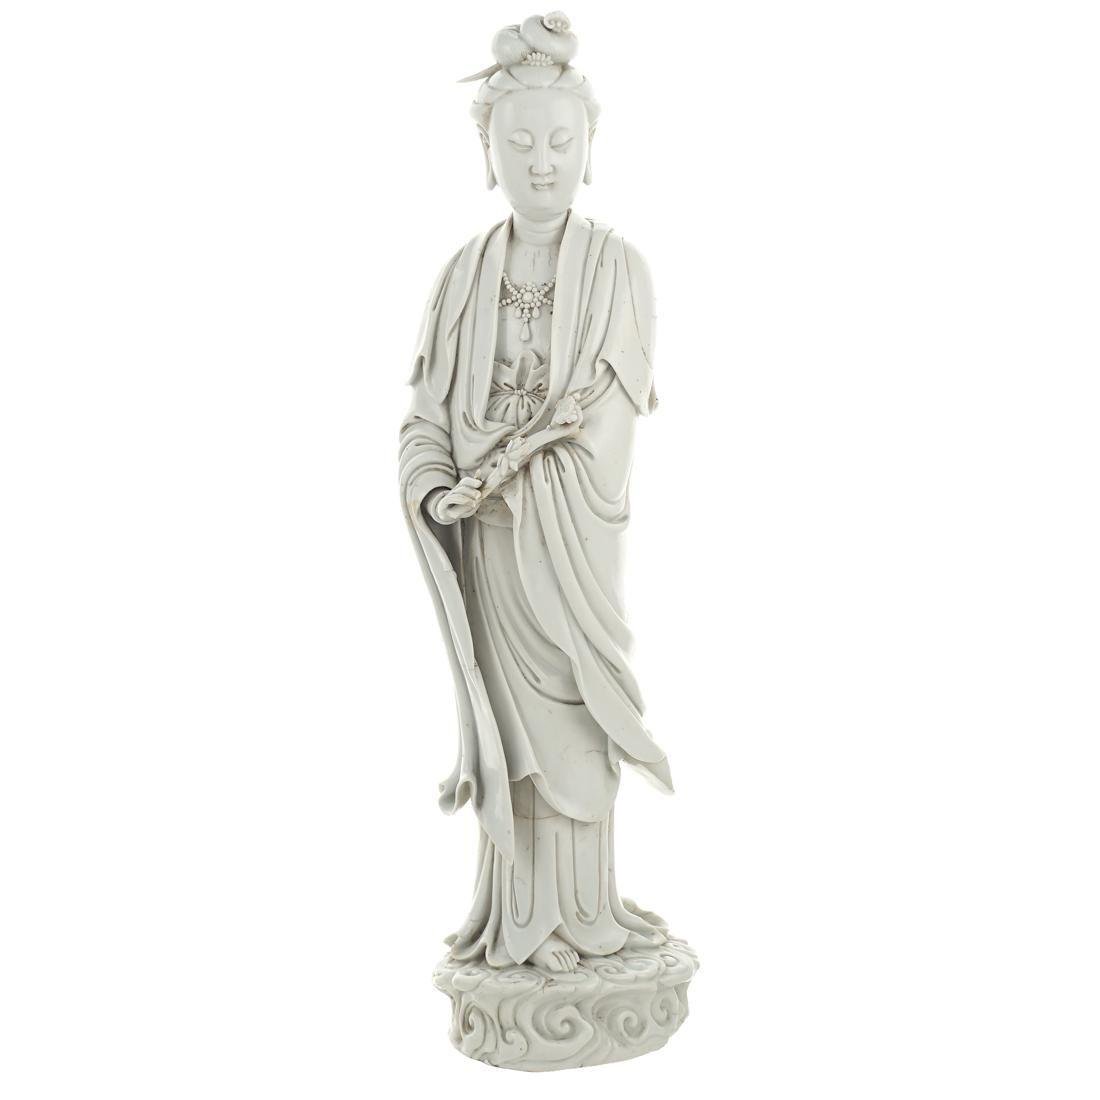 A blanc de China sculpture China, 19th century h. 52